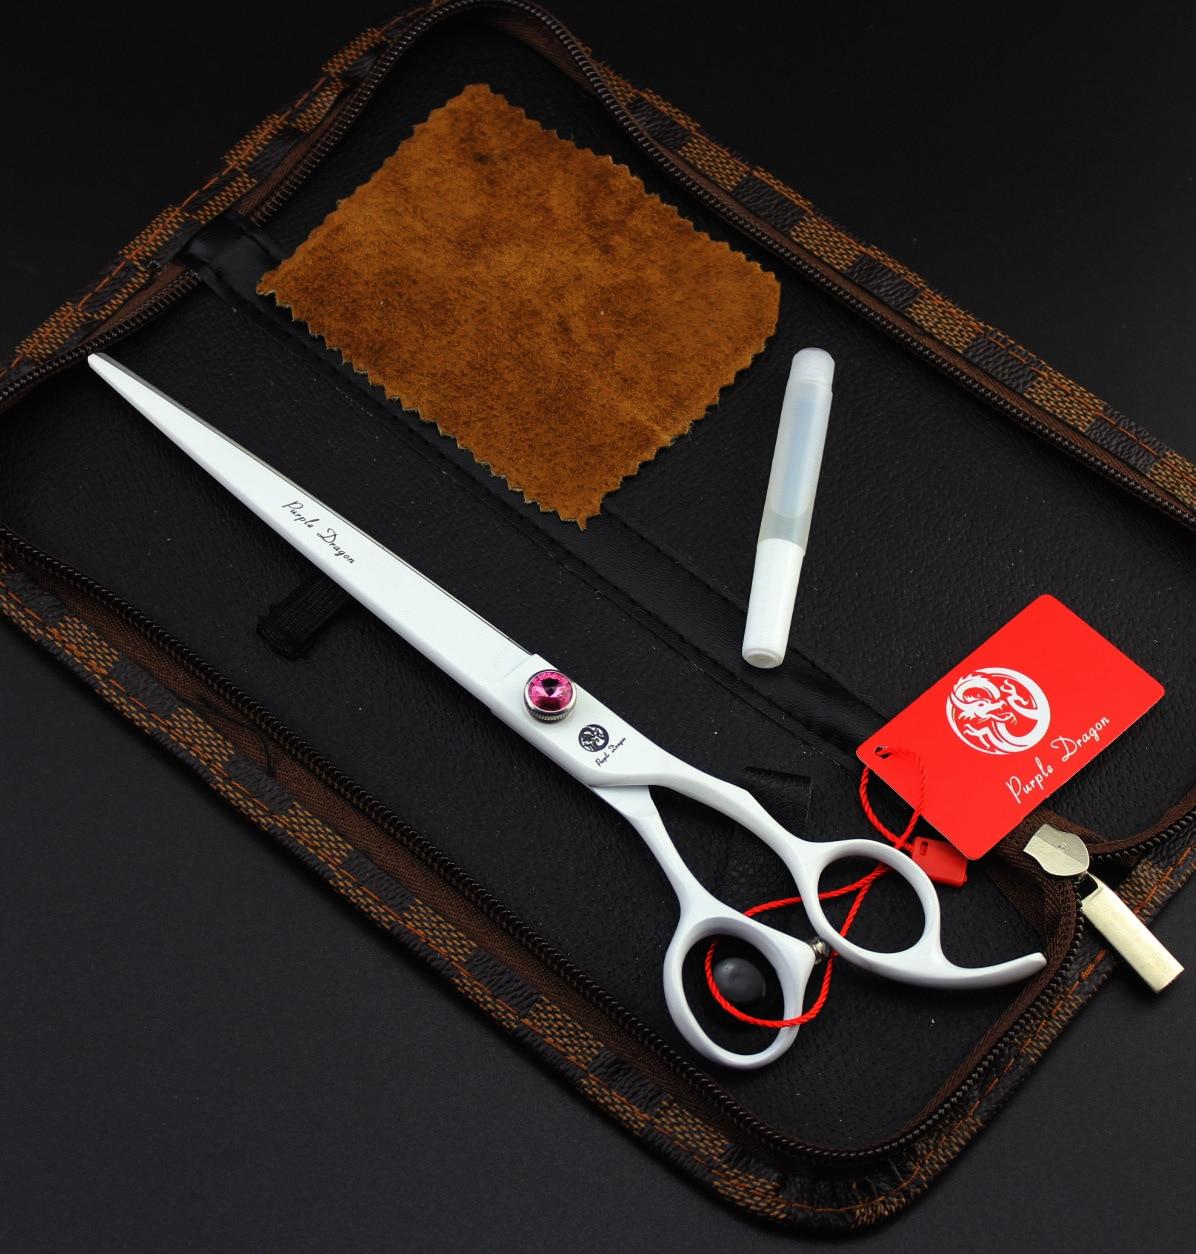 8 INCH hair cutting scissors Hairdressing scissors  8 INCH hair cutting scissors Hairdressing scissors